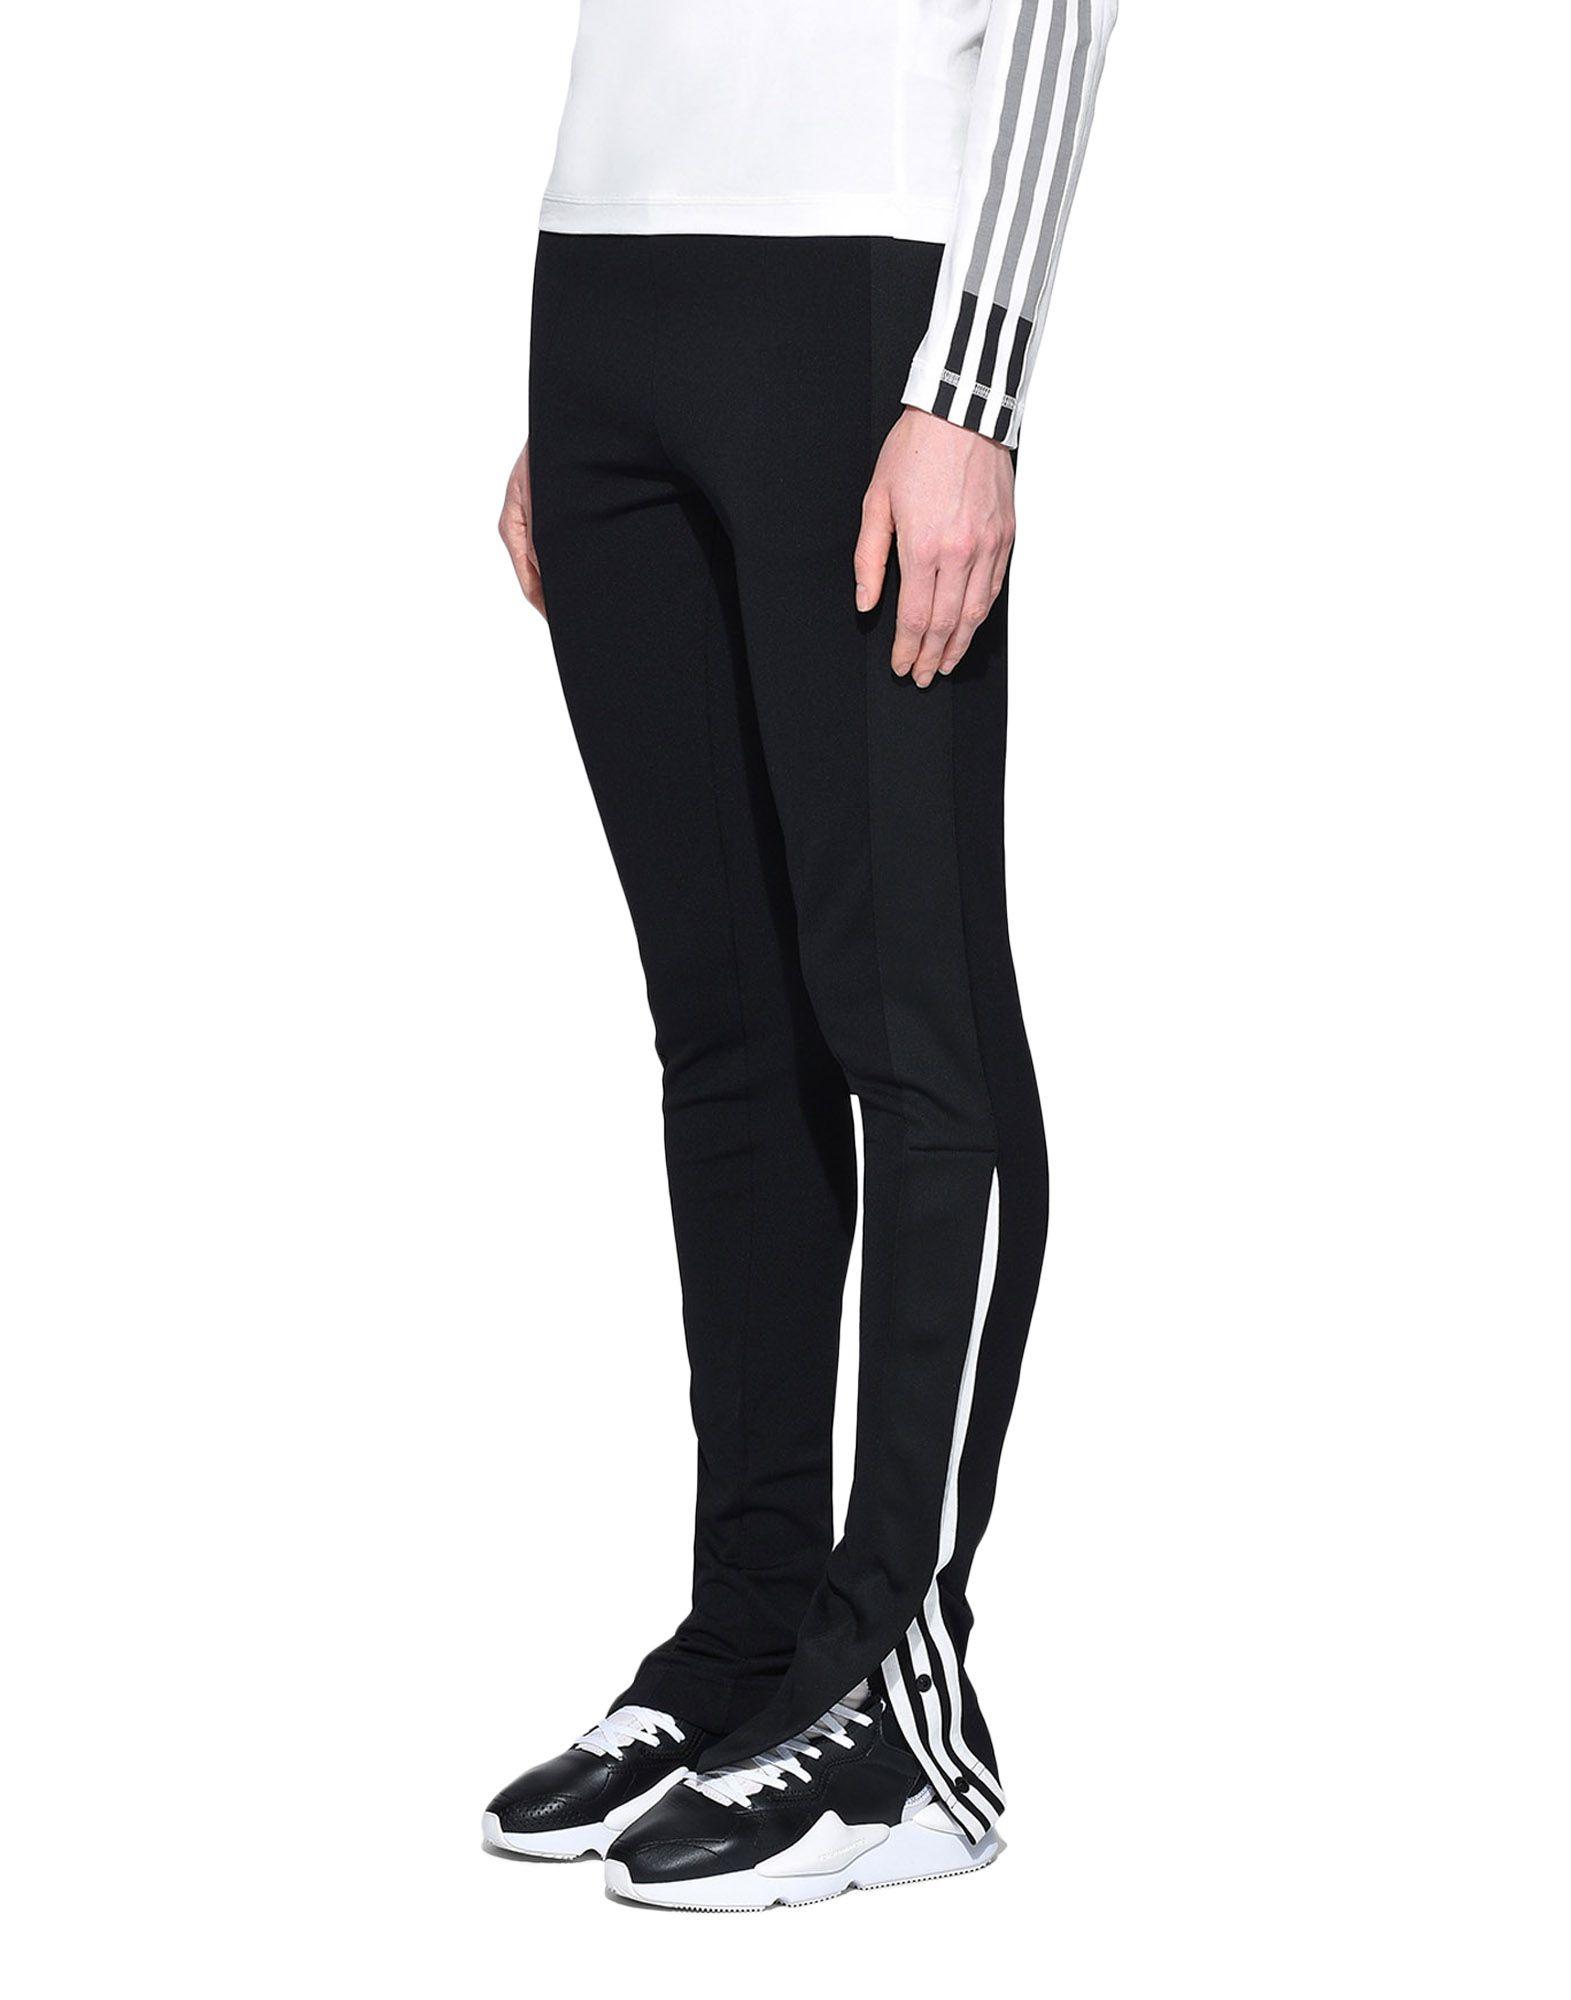 Y-3 Y-3 3-Stripes Firebird Track Pants Track pant Woman e